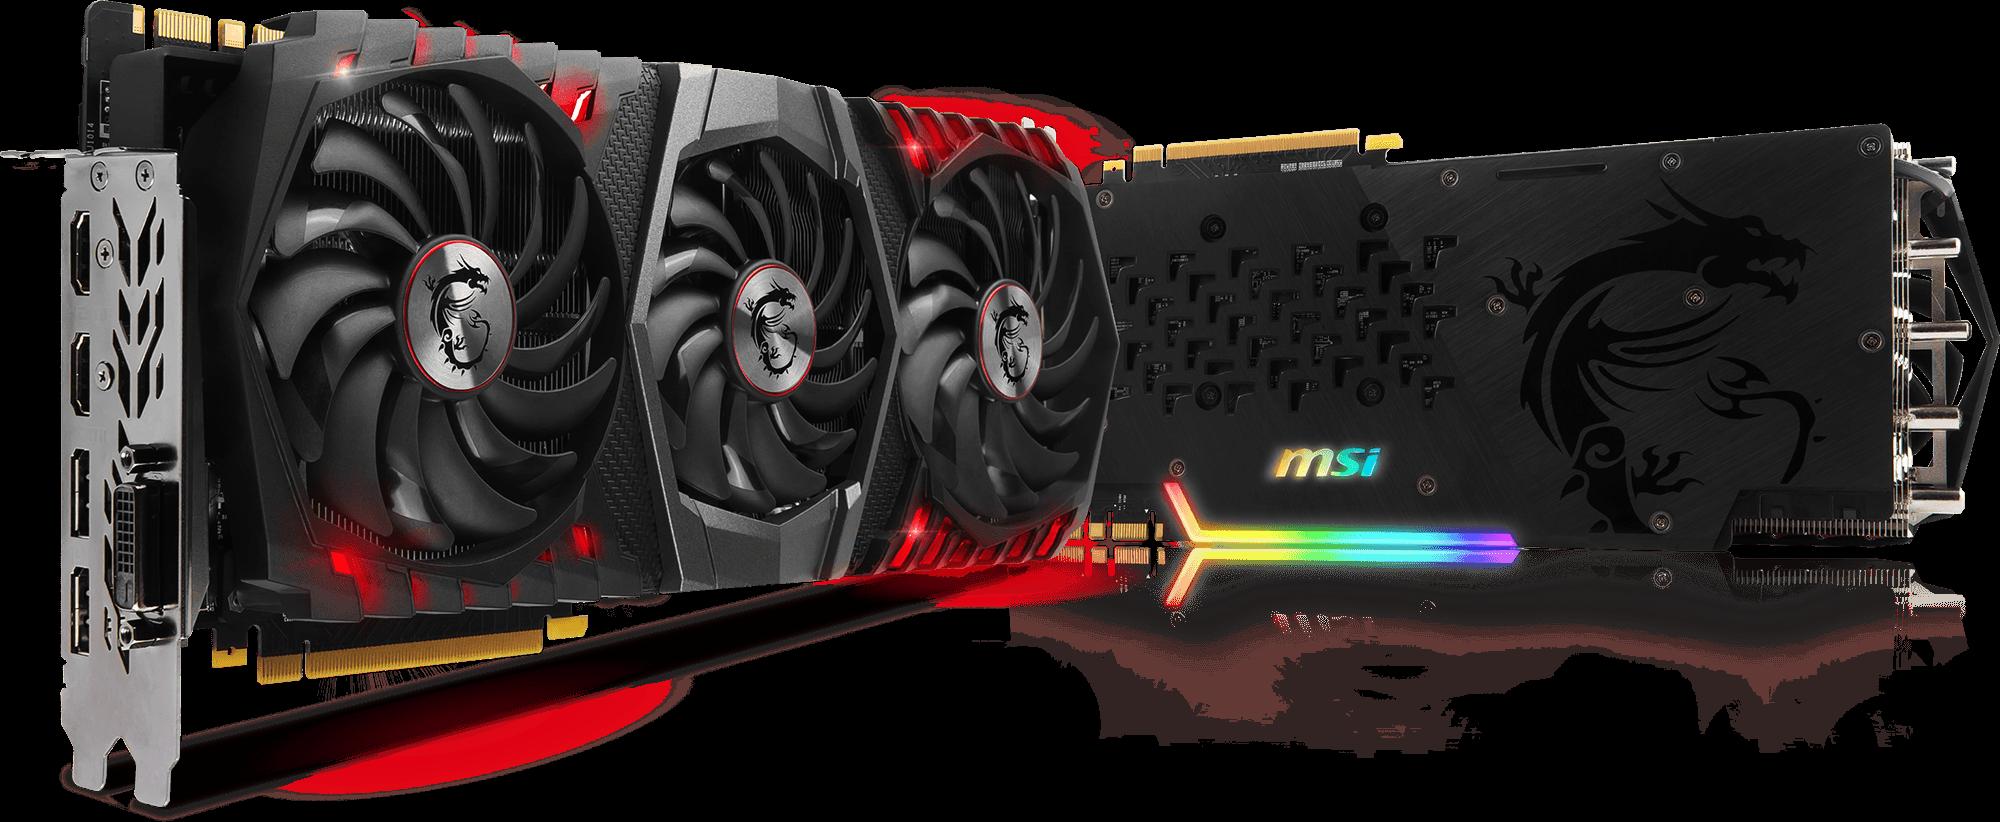 Gtx 1080 Ti Gaming X Trio Graphic Card Gaming Accessories Nvidia